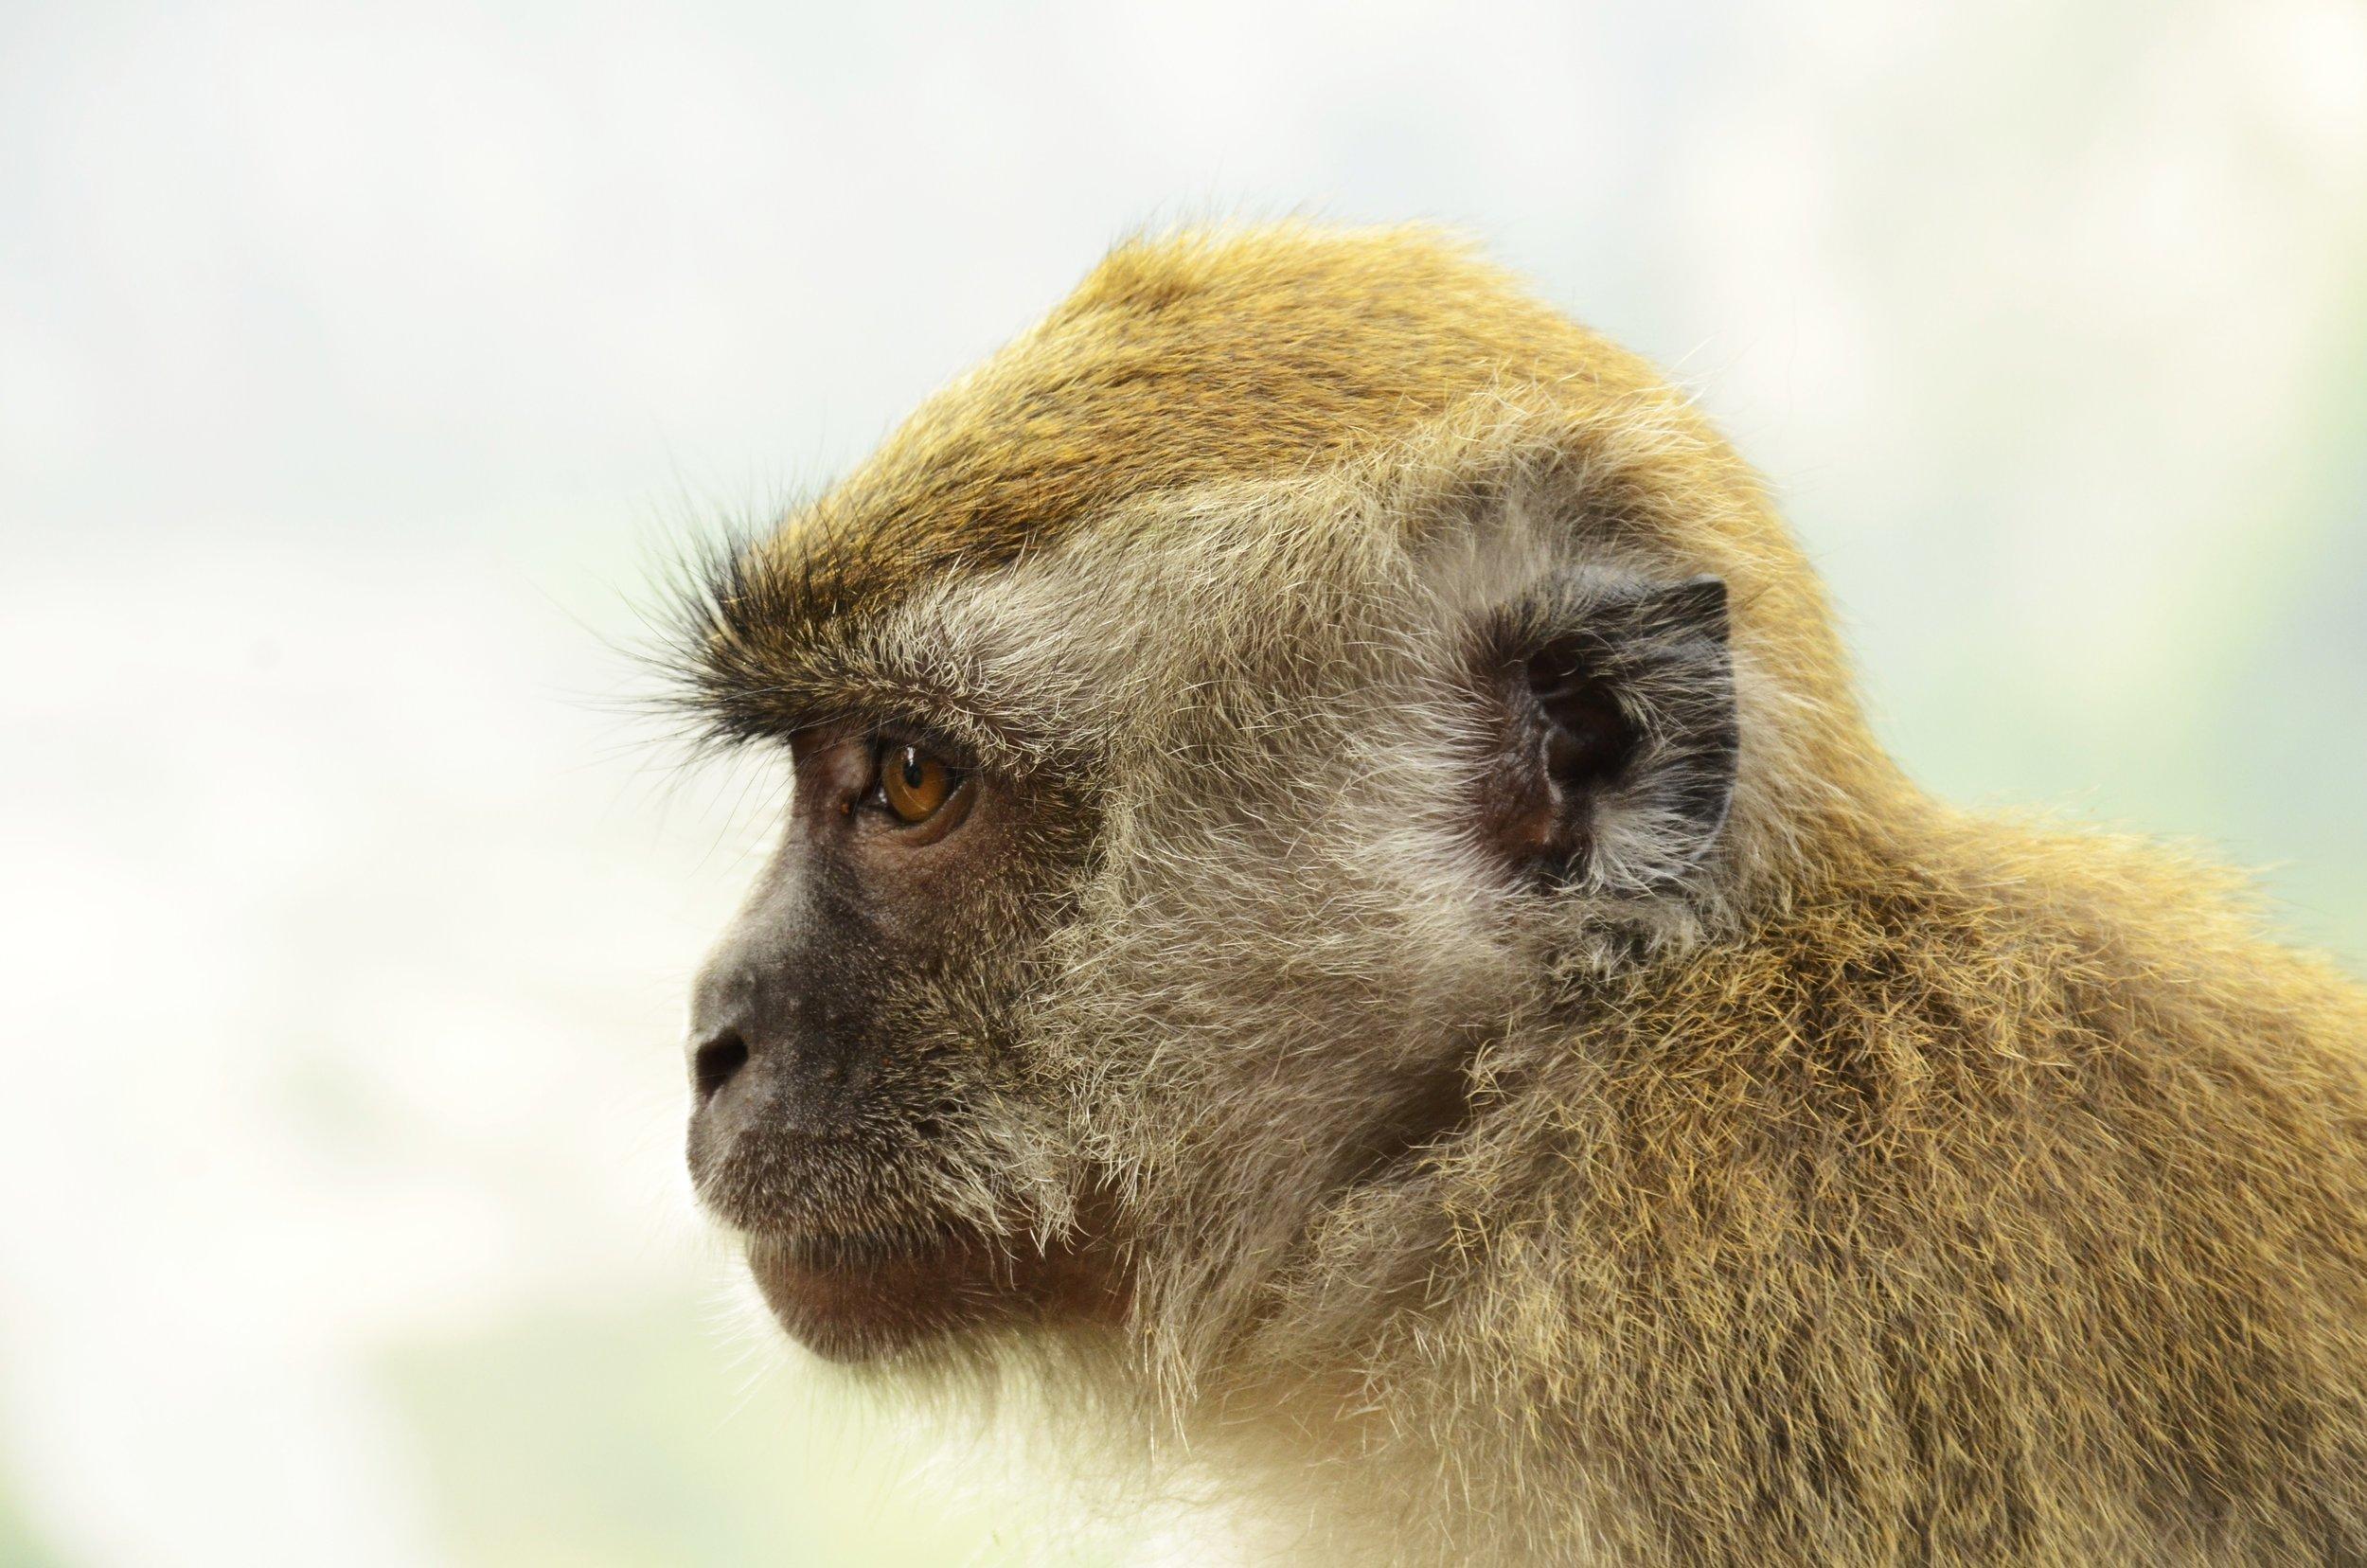 Makaak in Sumatra